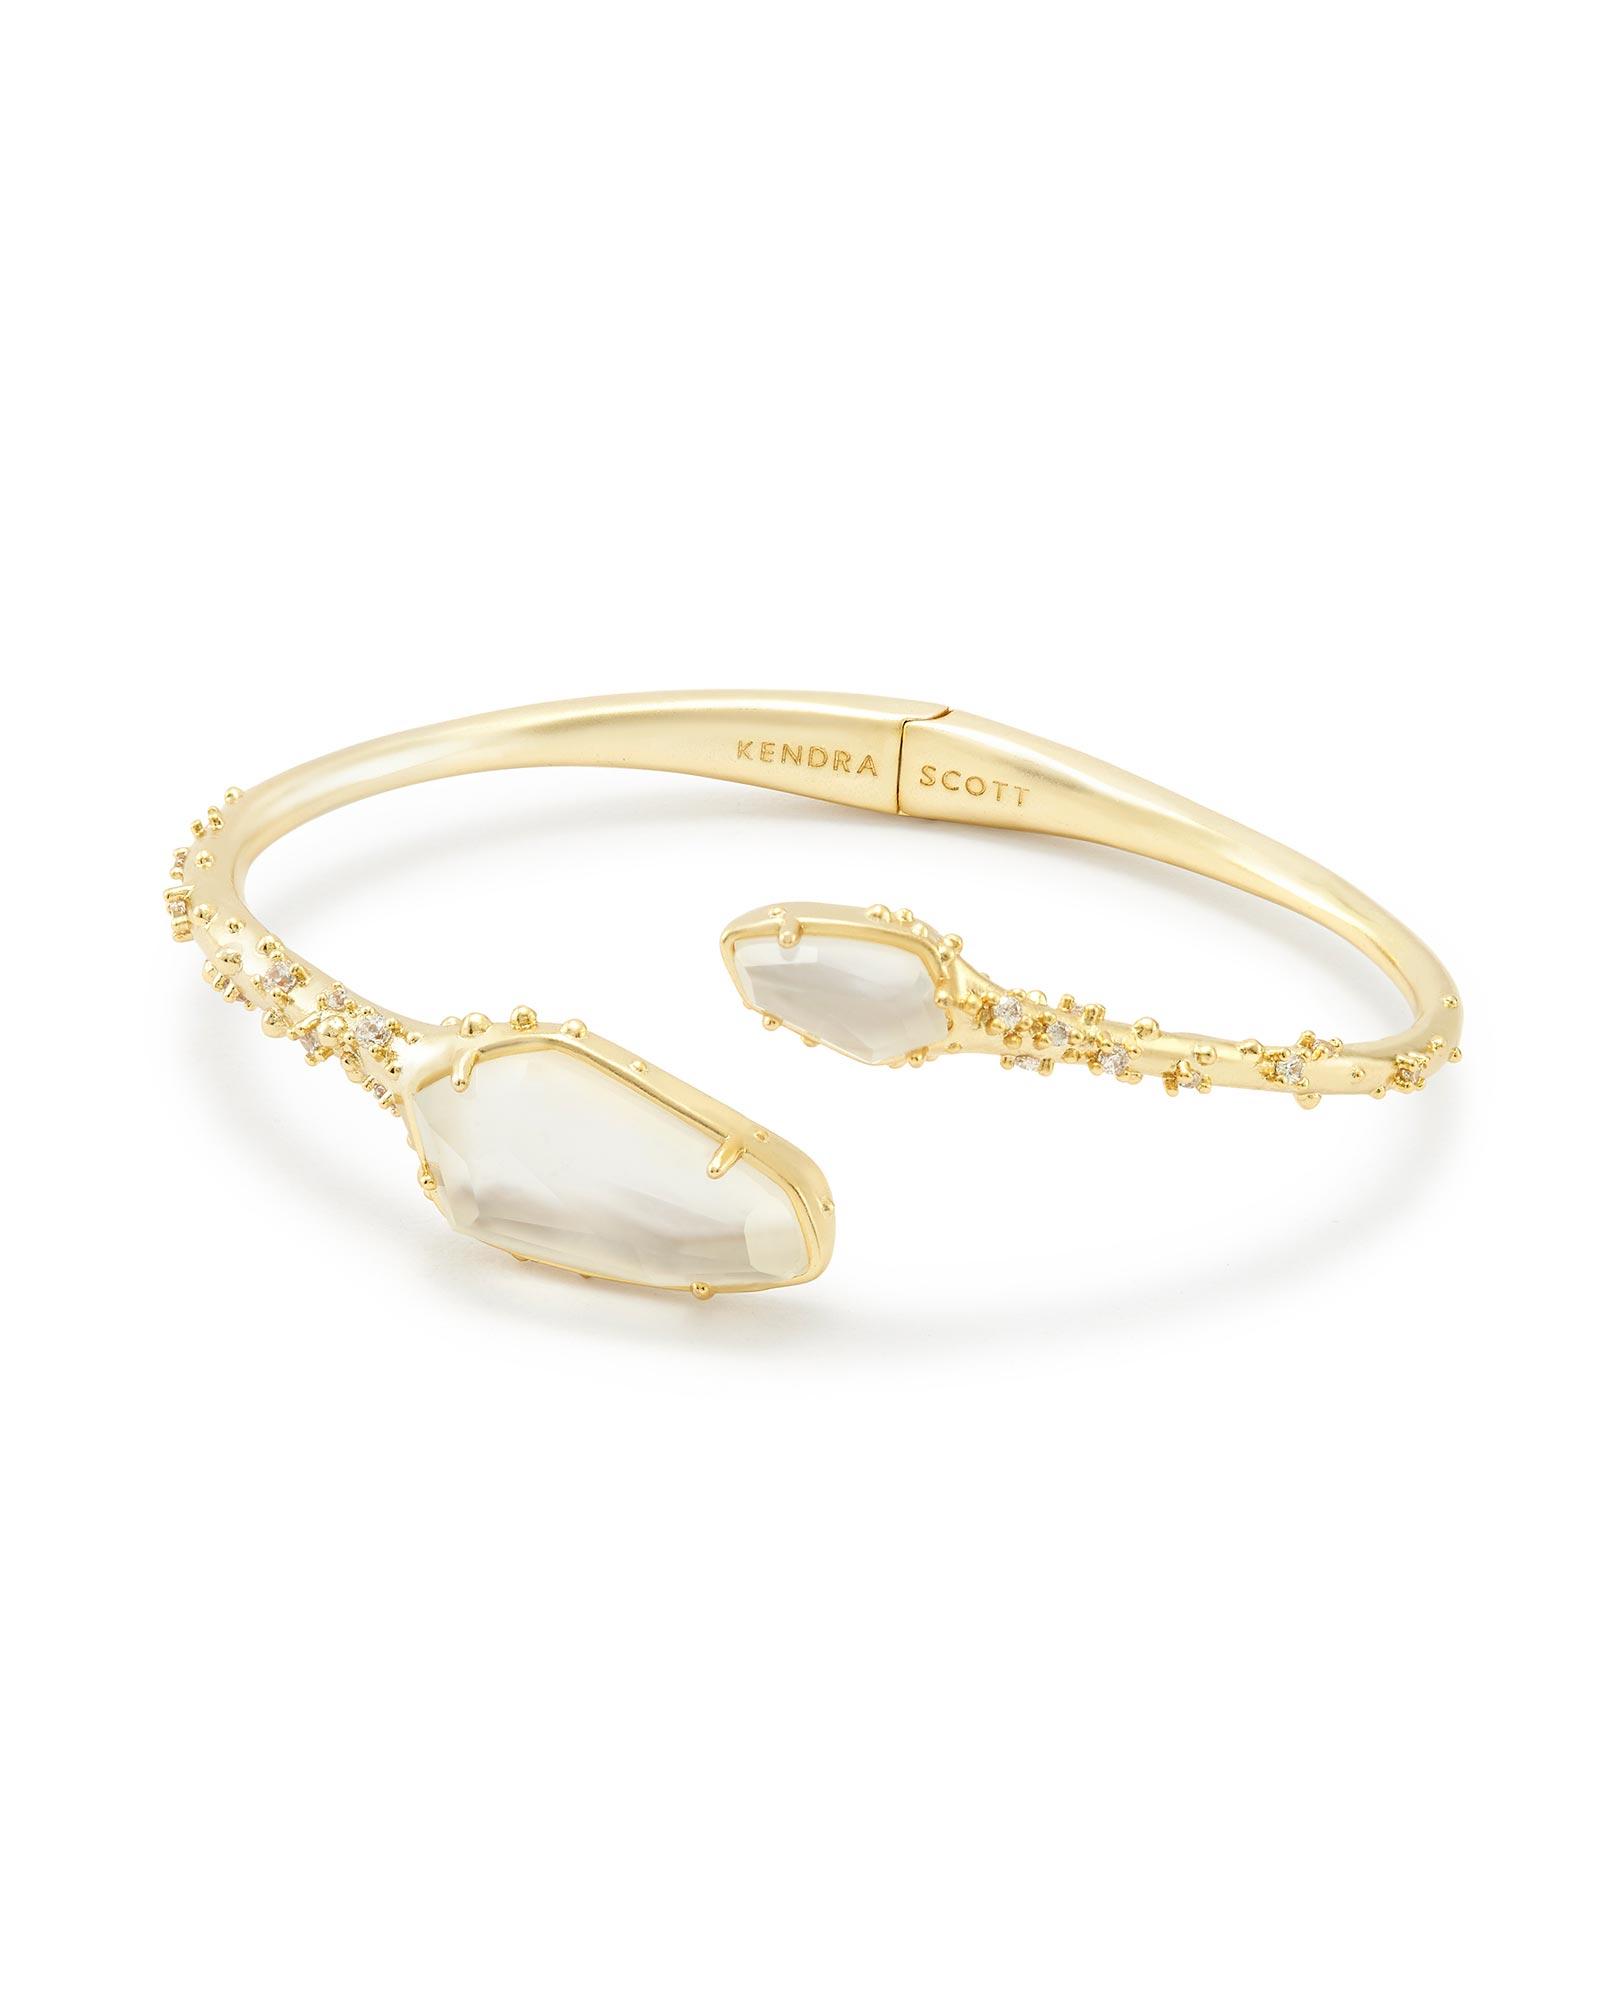 Zander Hinge Cuff Bracelet In Gold